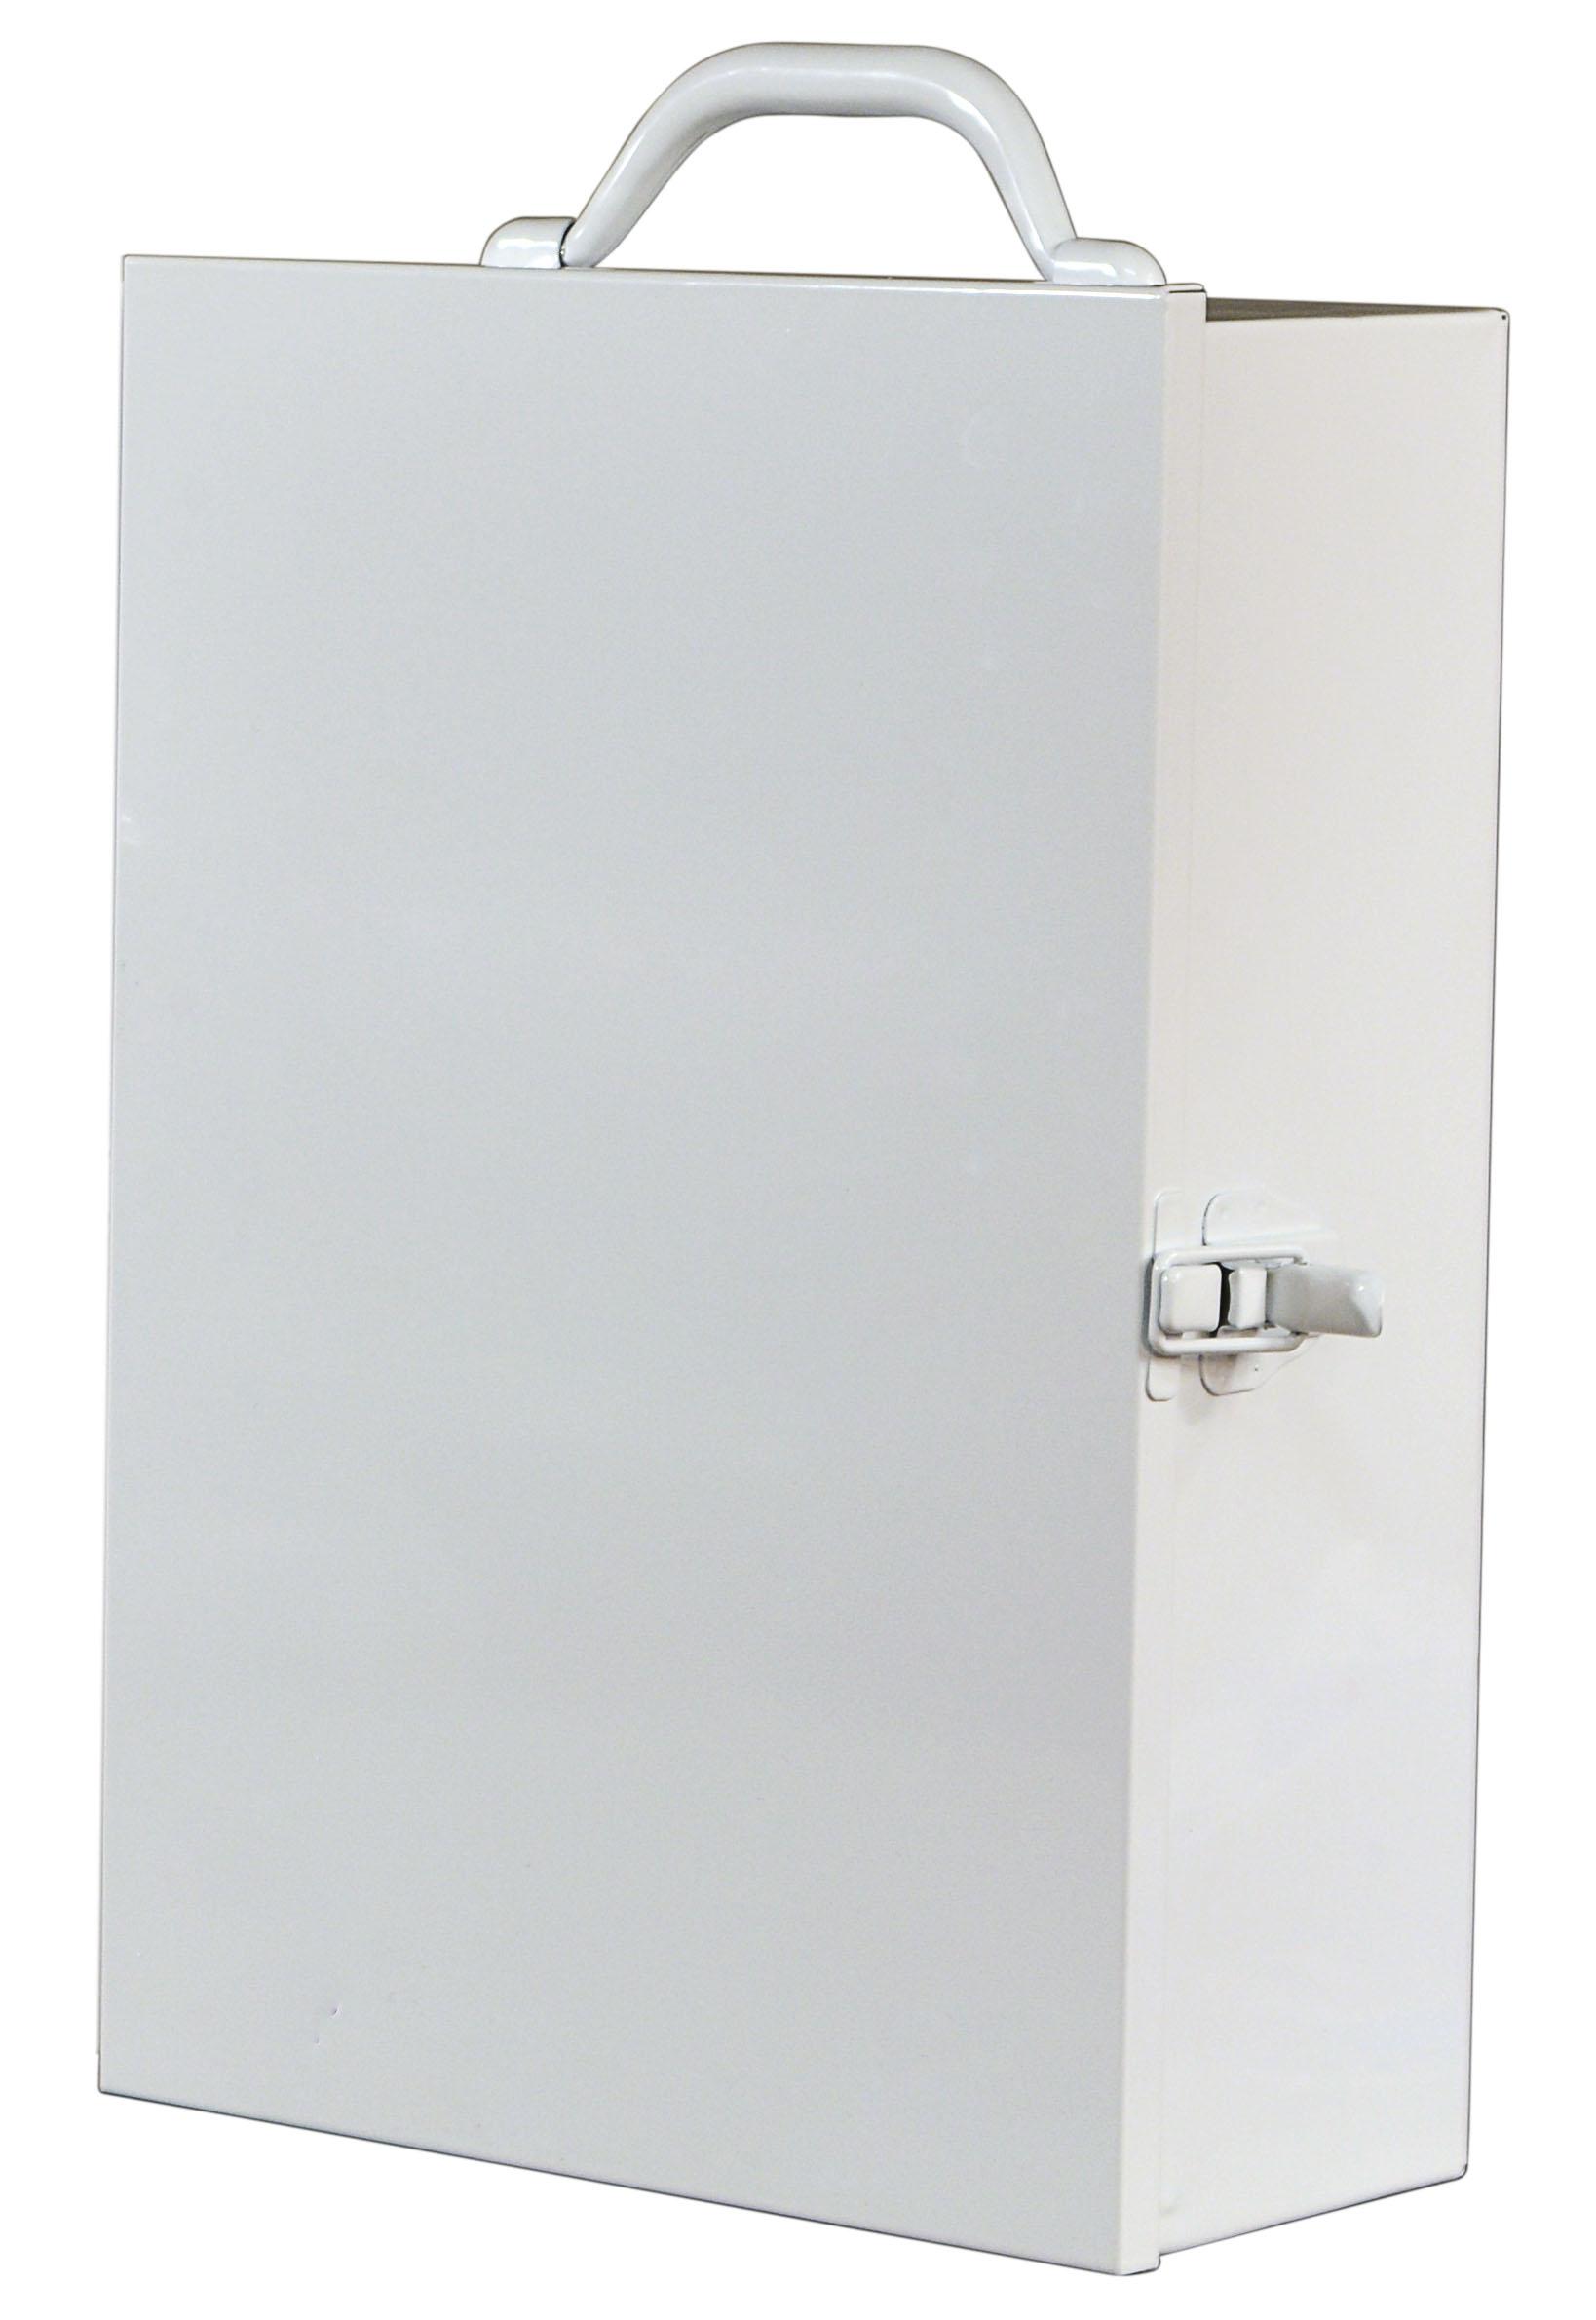 R209-038 - 75V - Empty Vertical 3-Shelf Cabinet - web